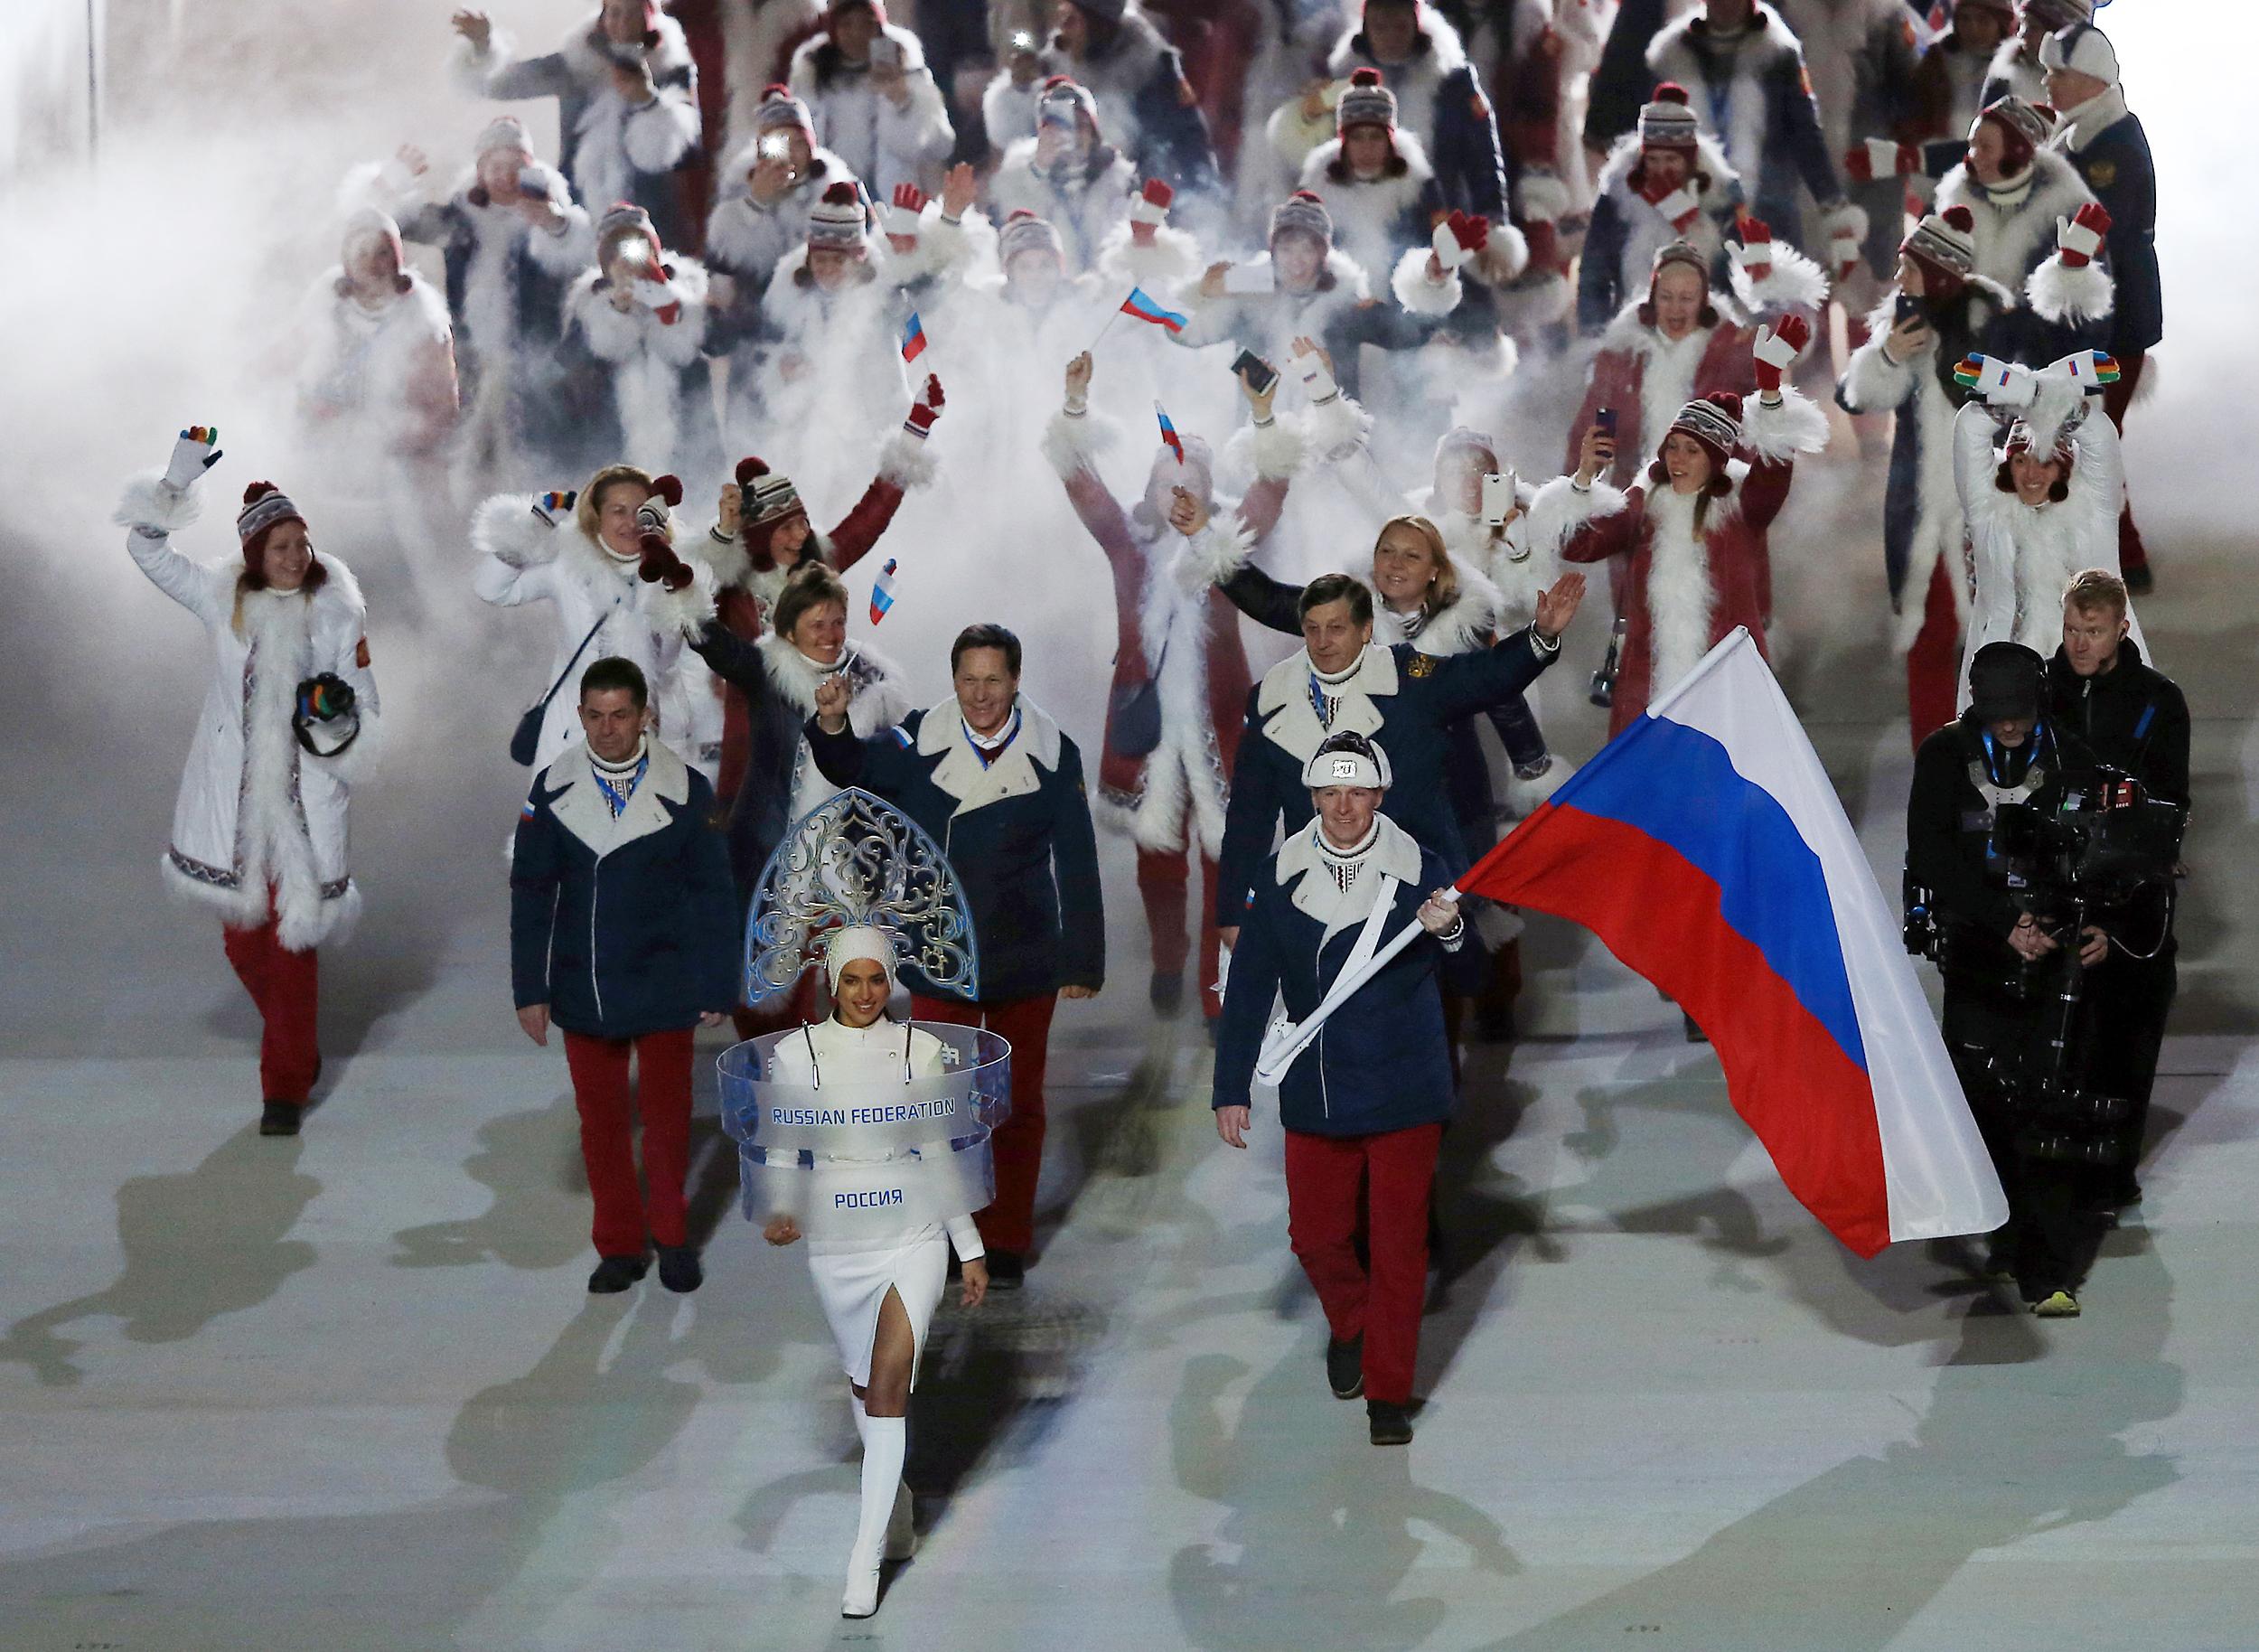 Americans can boycott the Sochi Olympics 07/17/2013 19